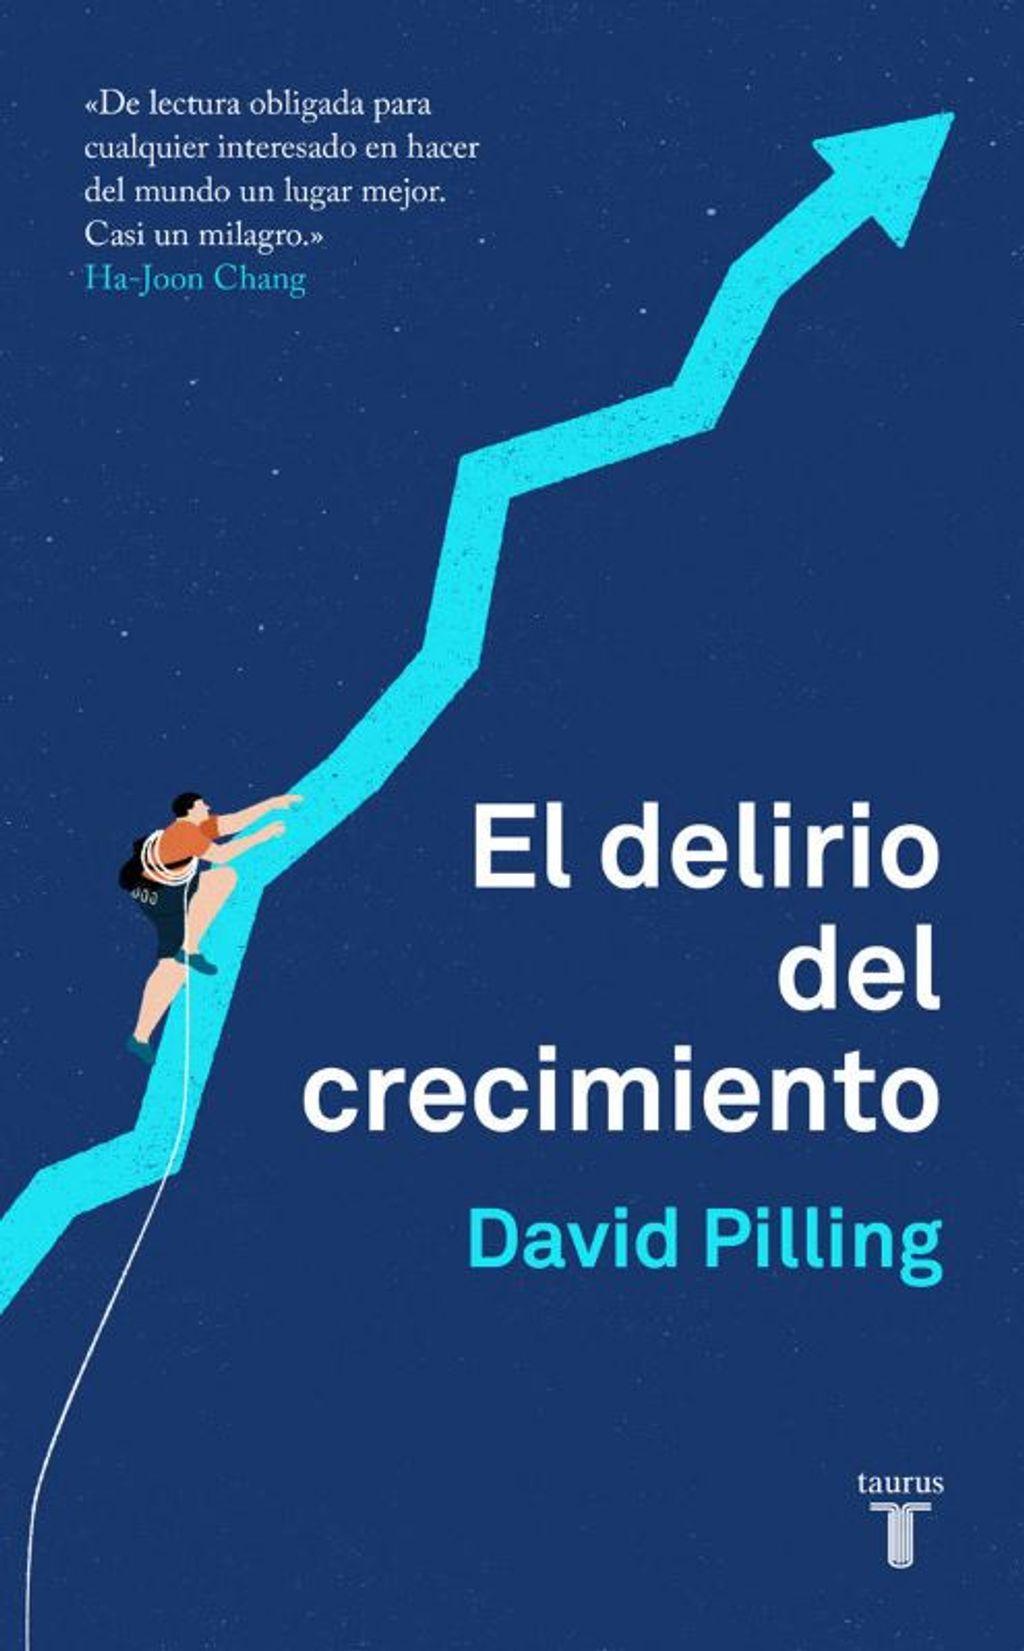 David Pilling